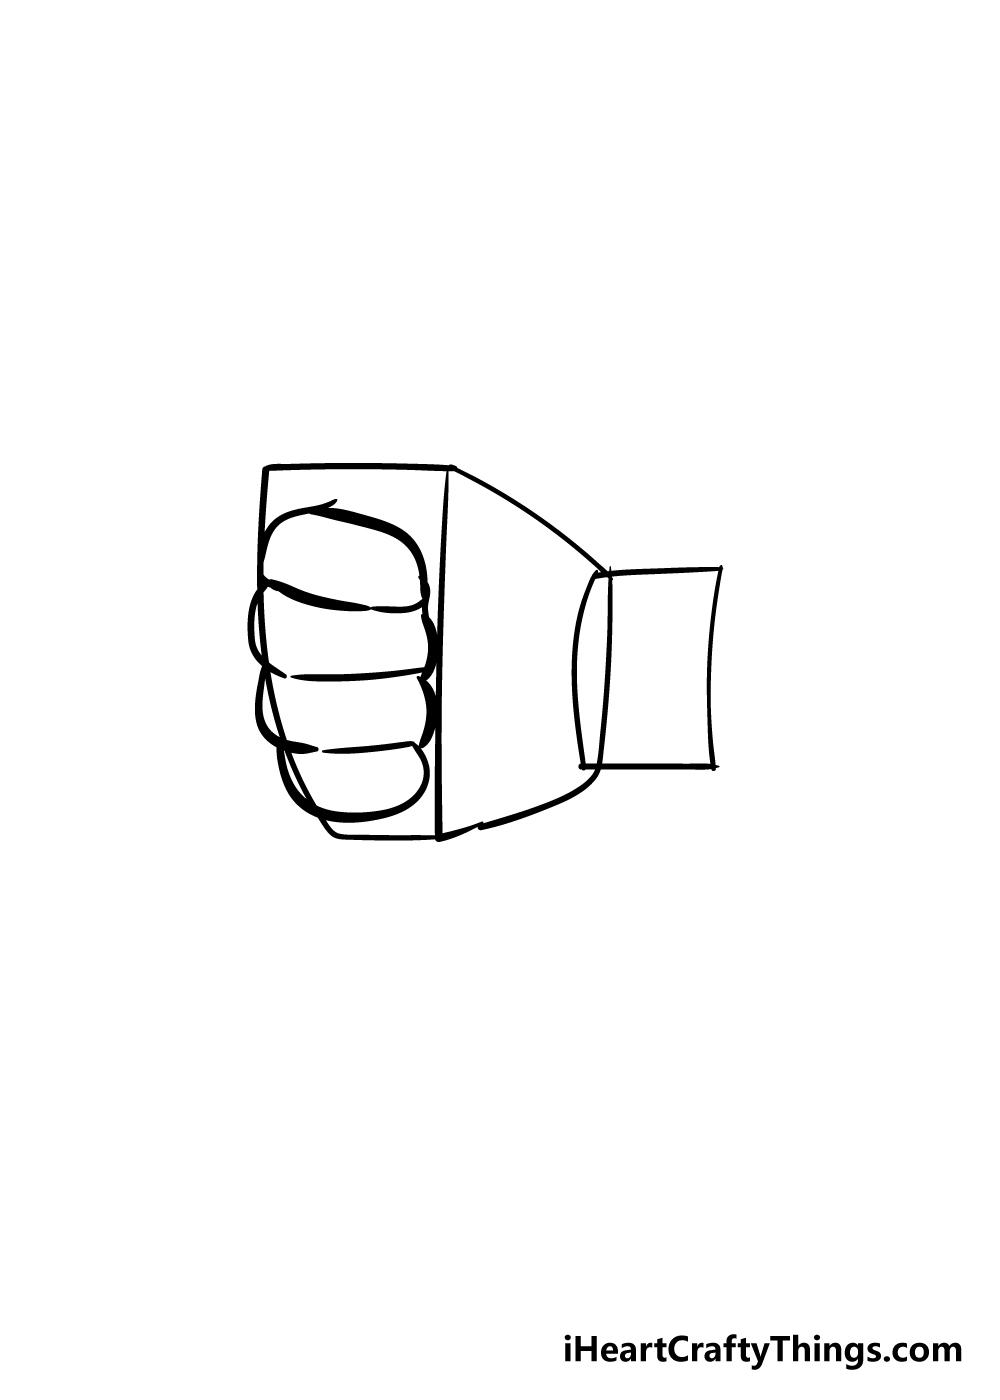 fist drawing step 2